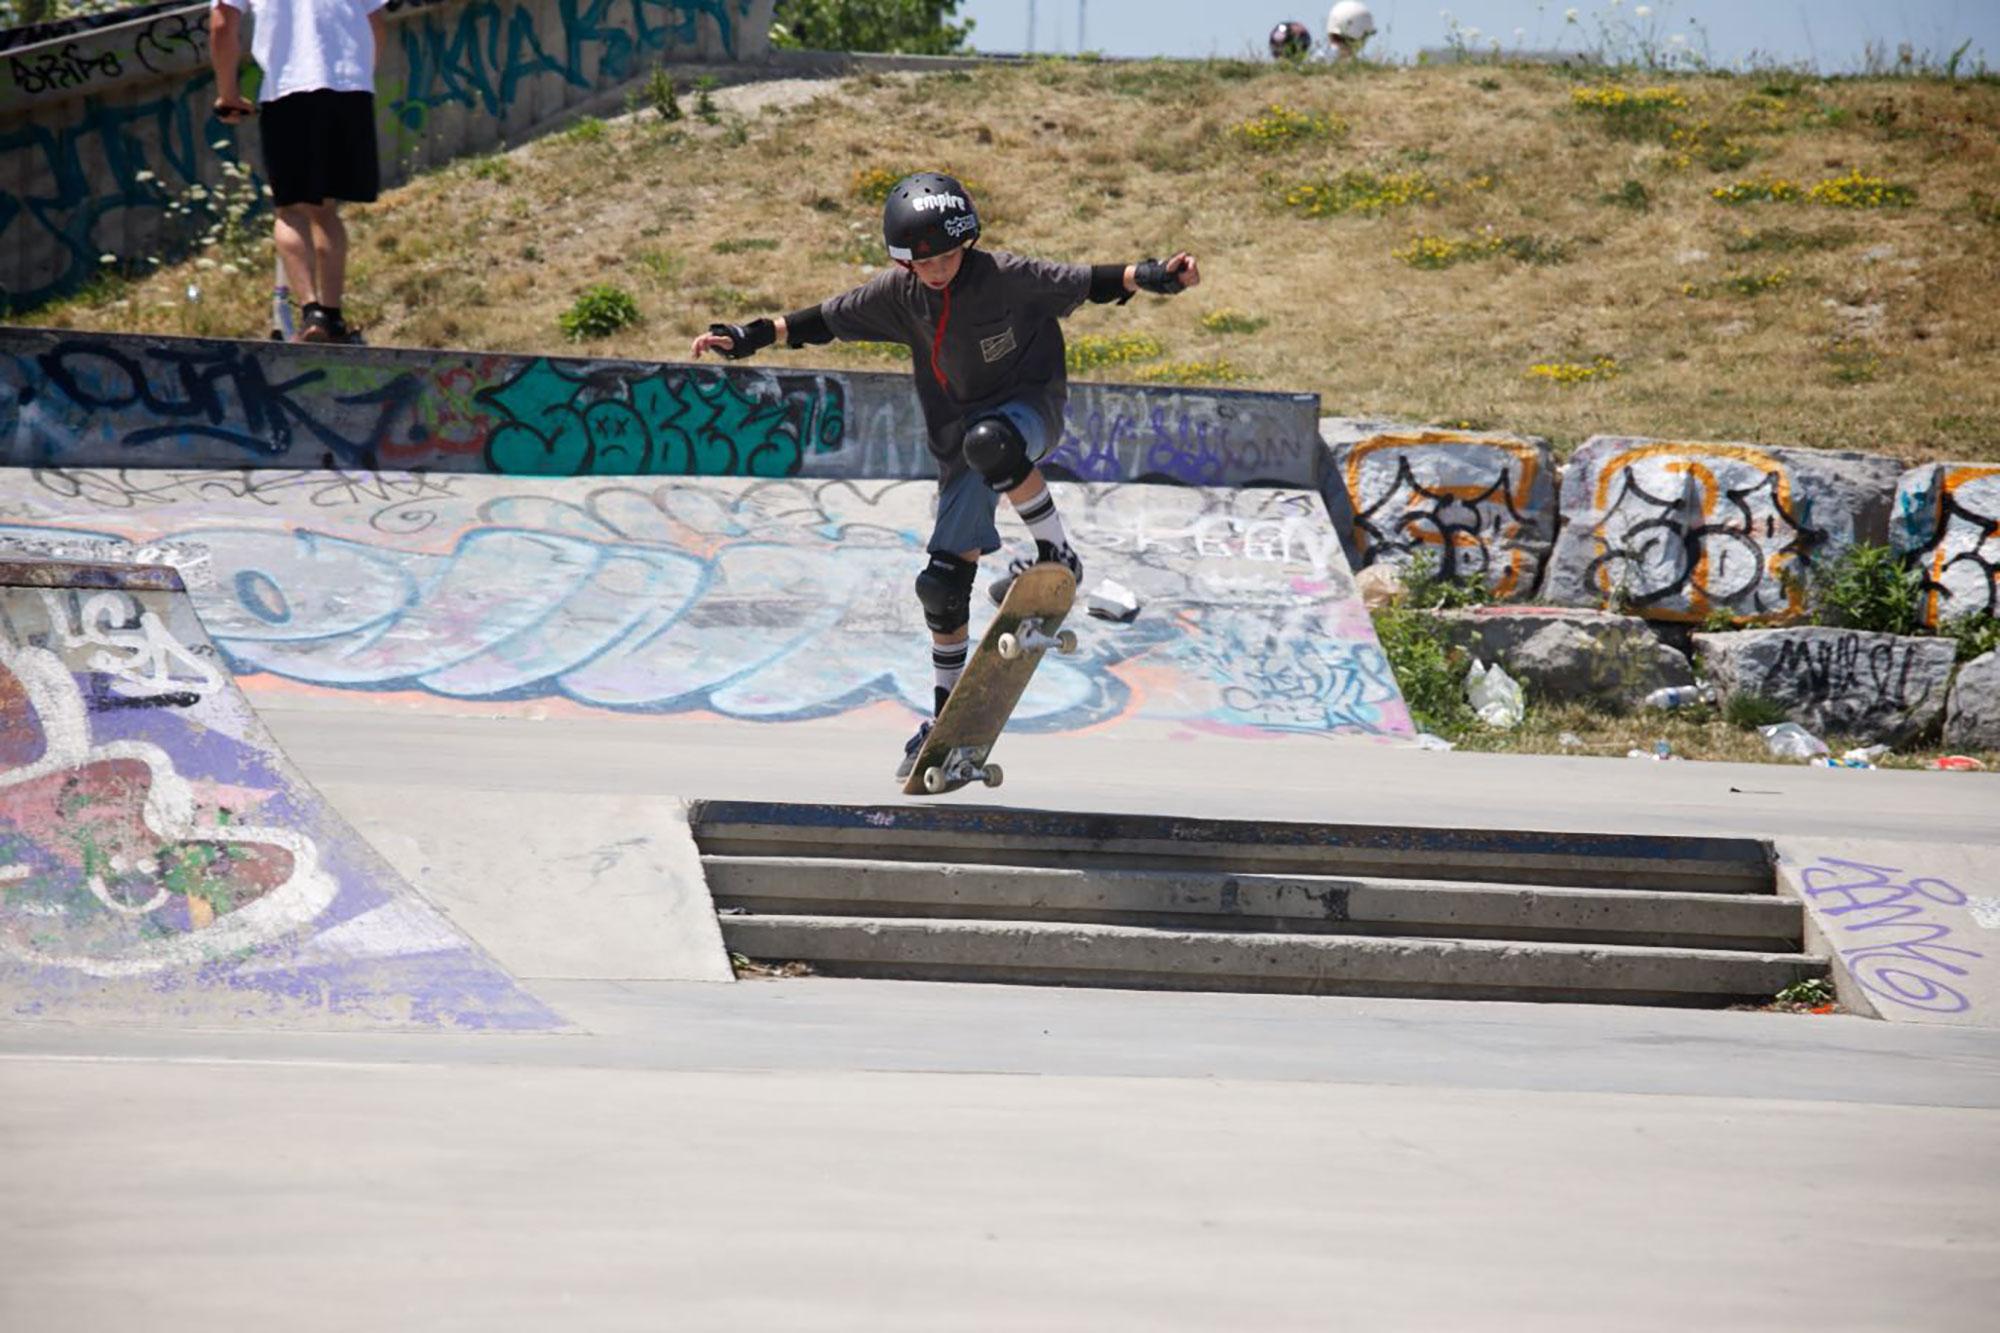 Skate camp tricks